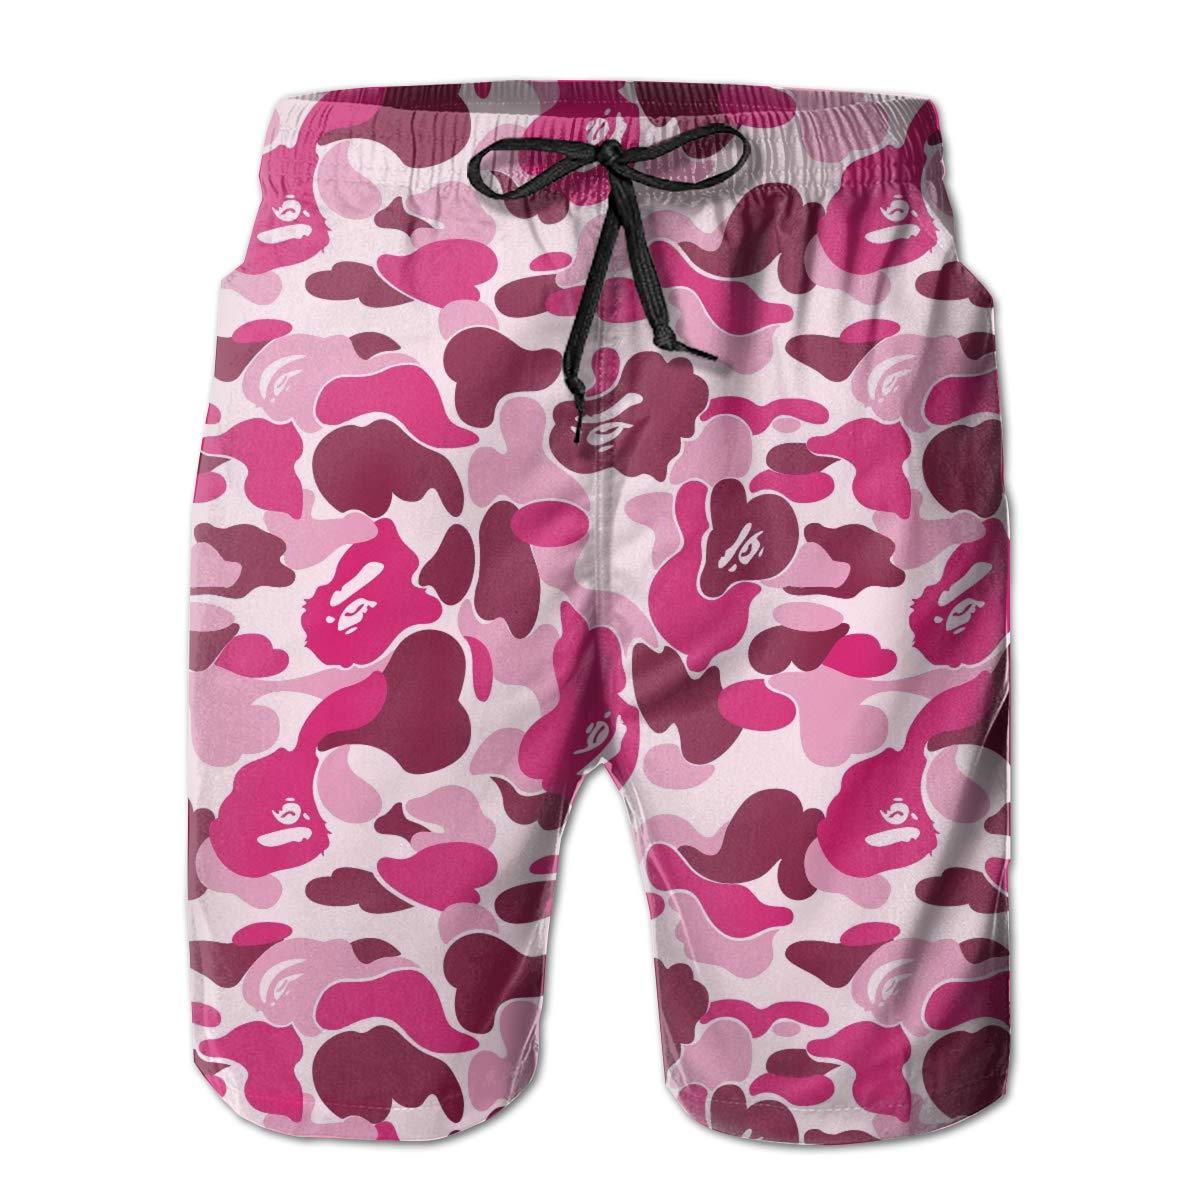 92f18d5fa4 Amazon.com: Partrest Pink Bape Camo Men's Summer Casual Shorts Beachwear  Sports Swimming Short Trunks Quick Dry Swim Trunks: Clothing